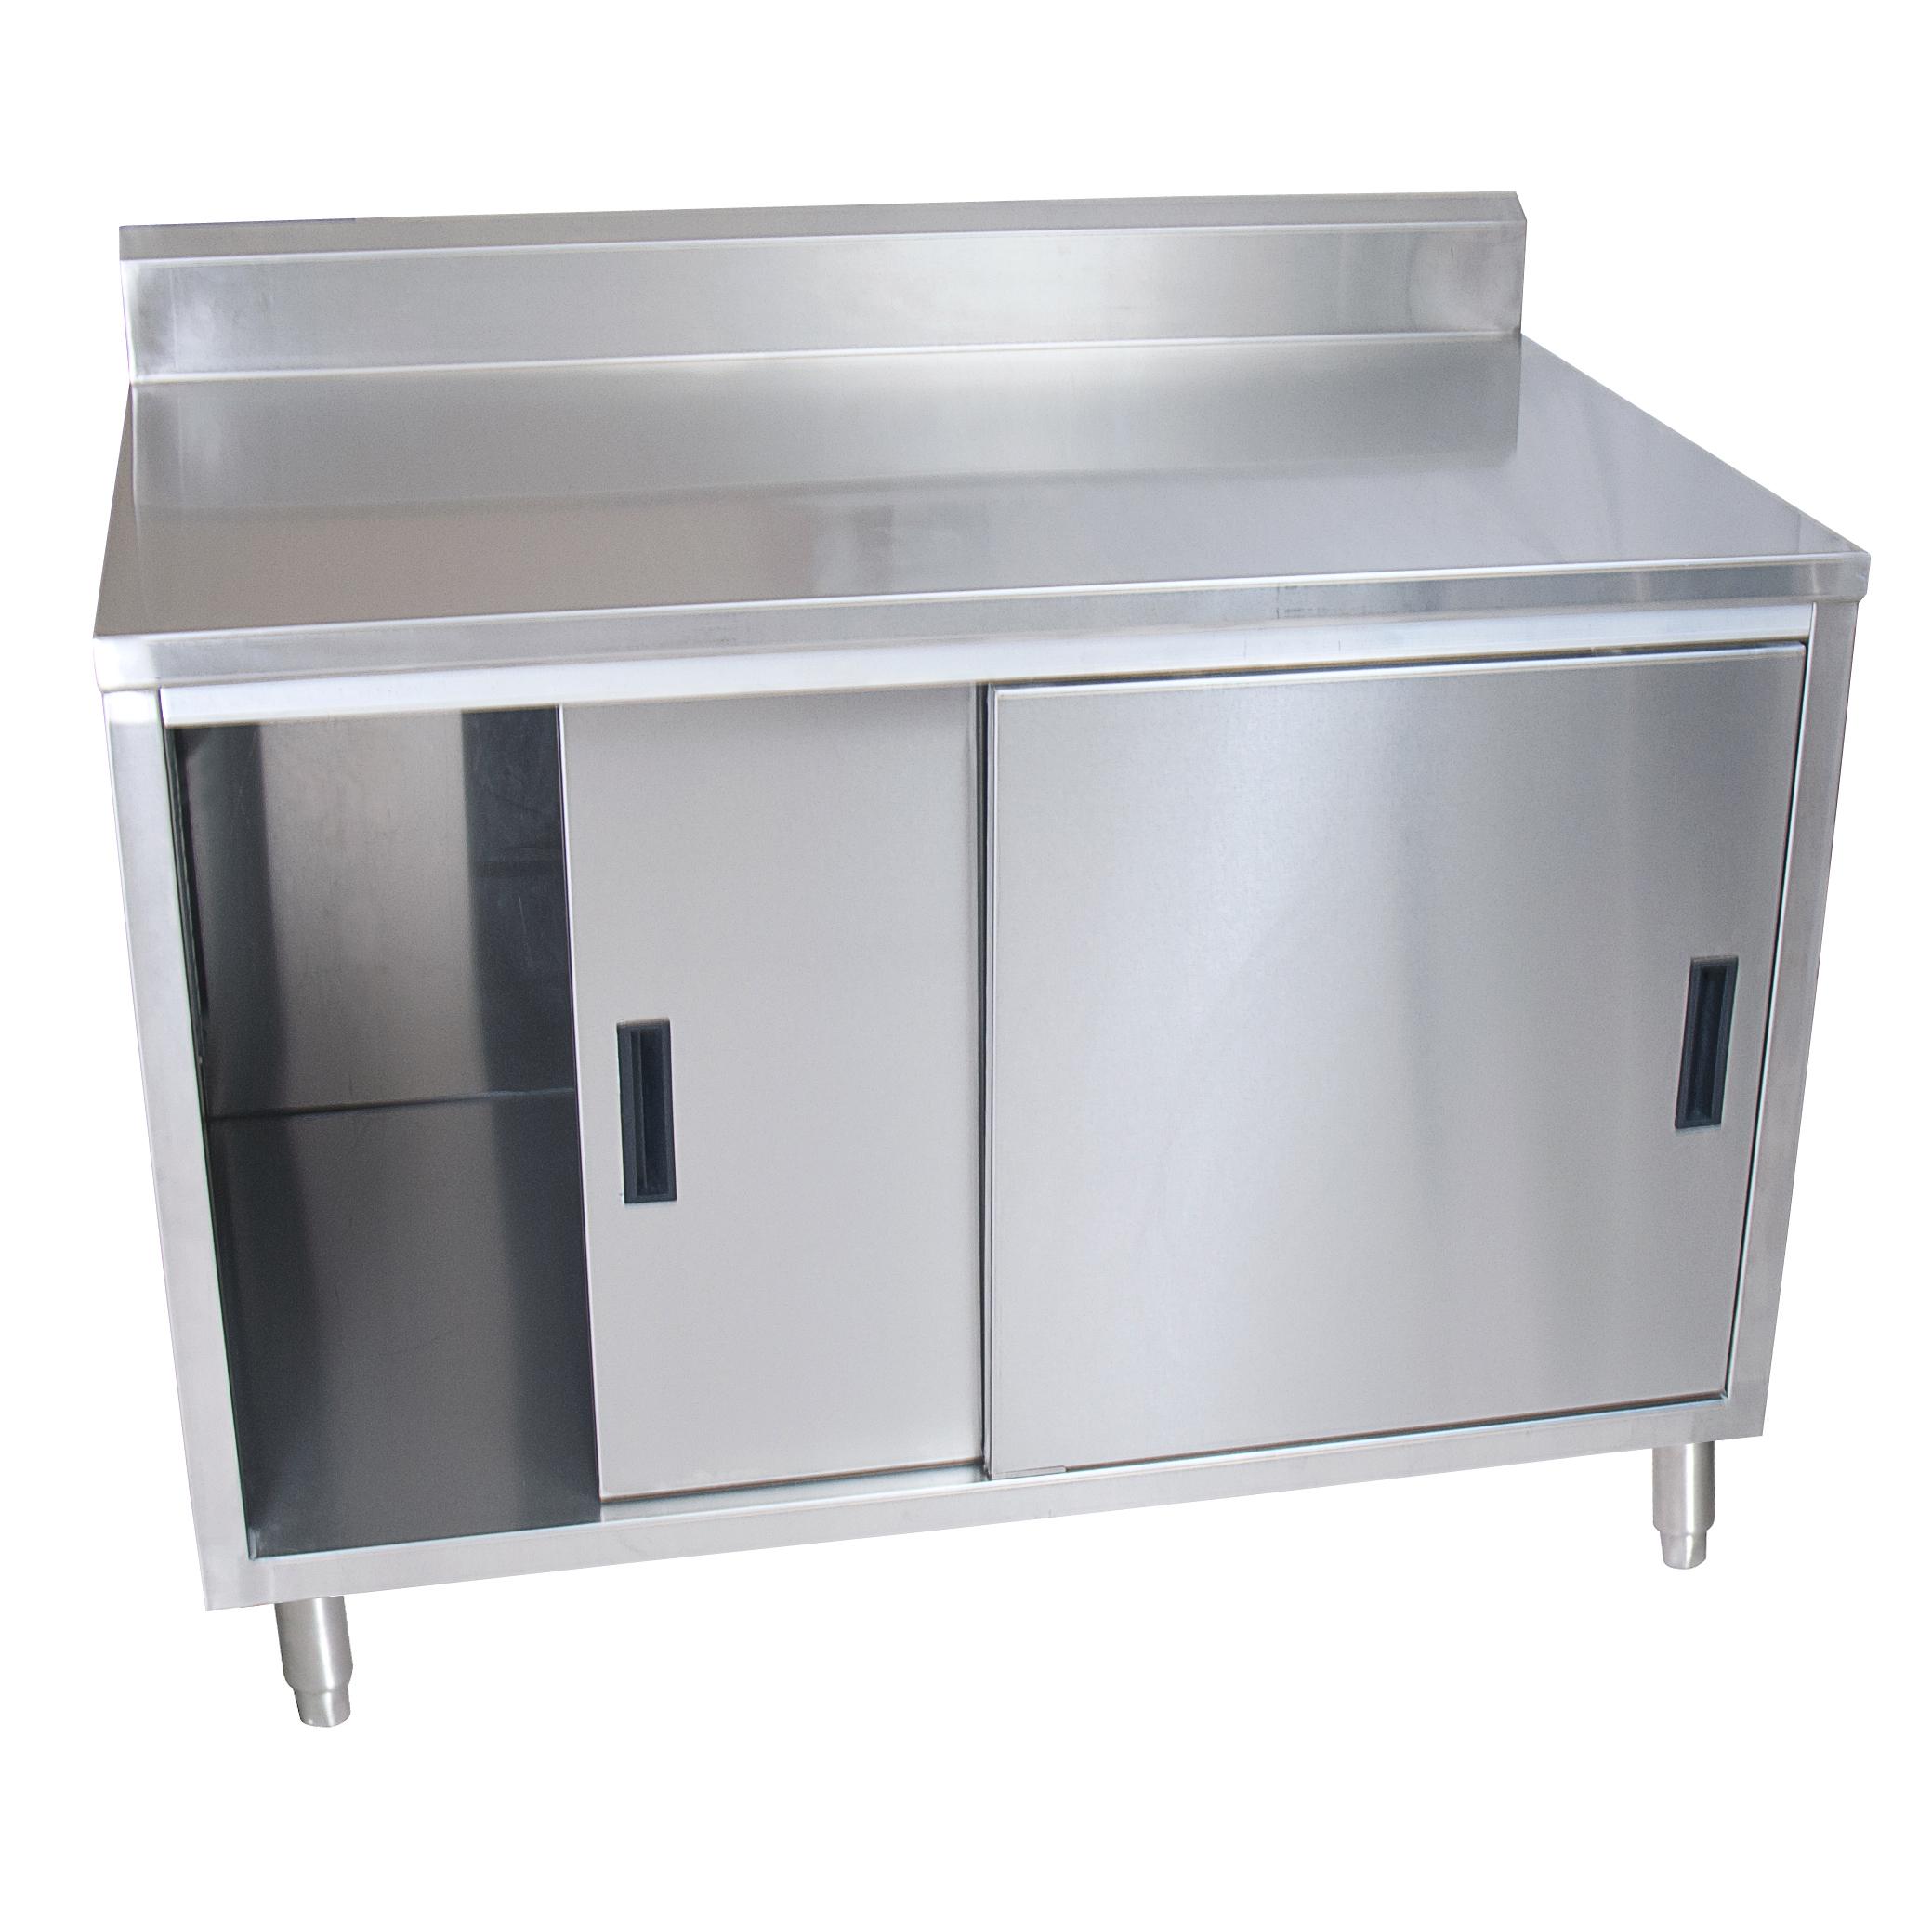 BK Resources BKDCR5-3072S work table, cabinet base sliding doors